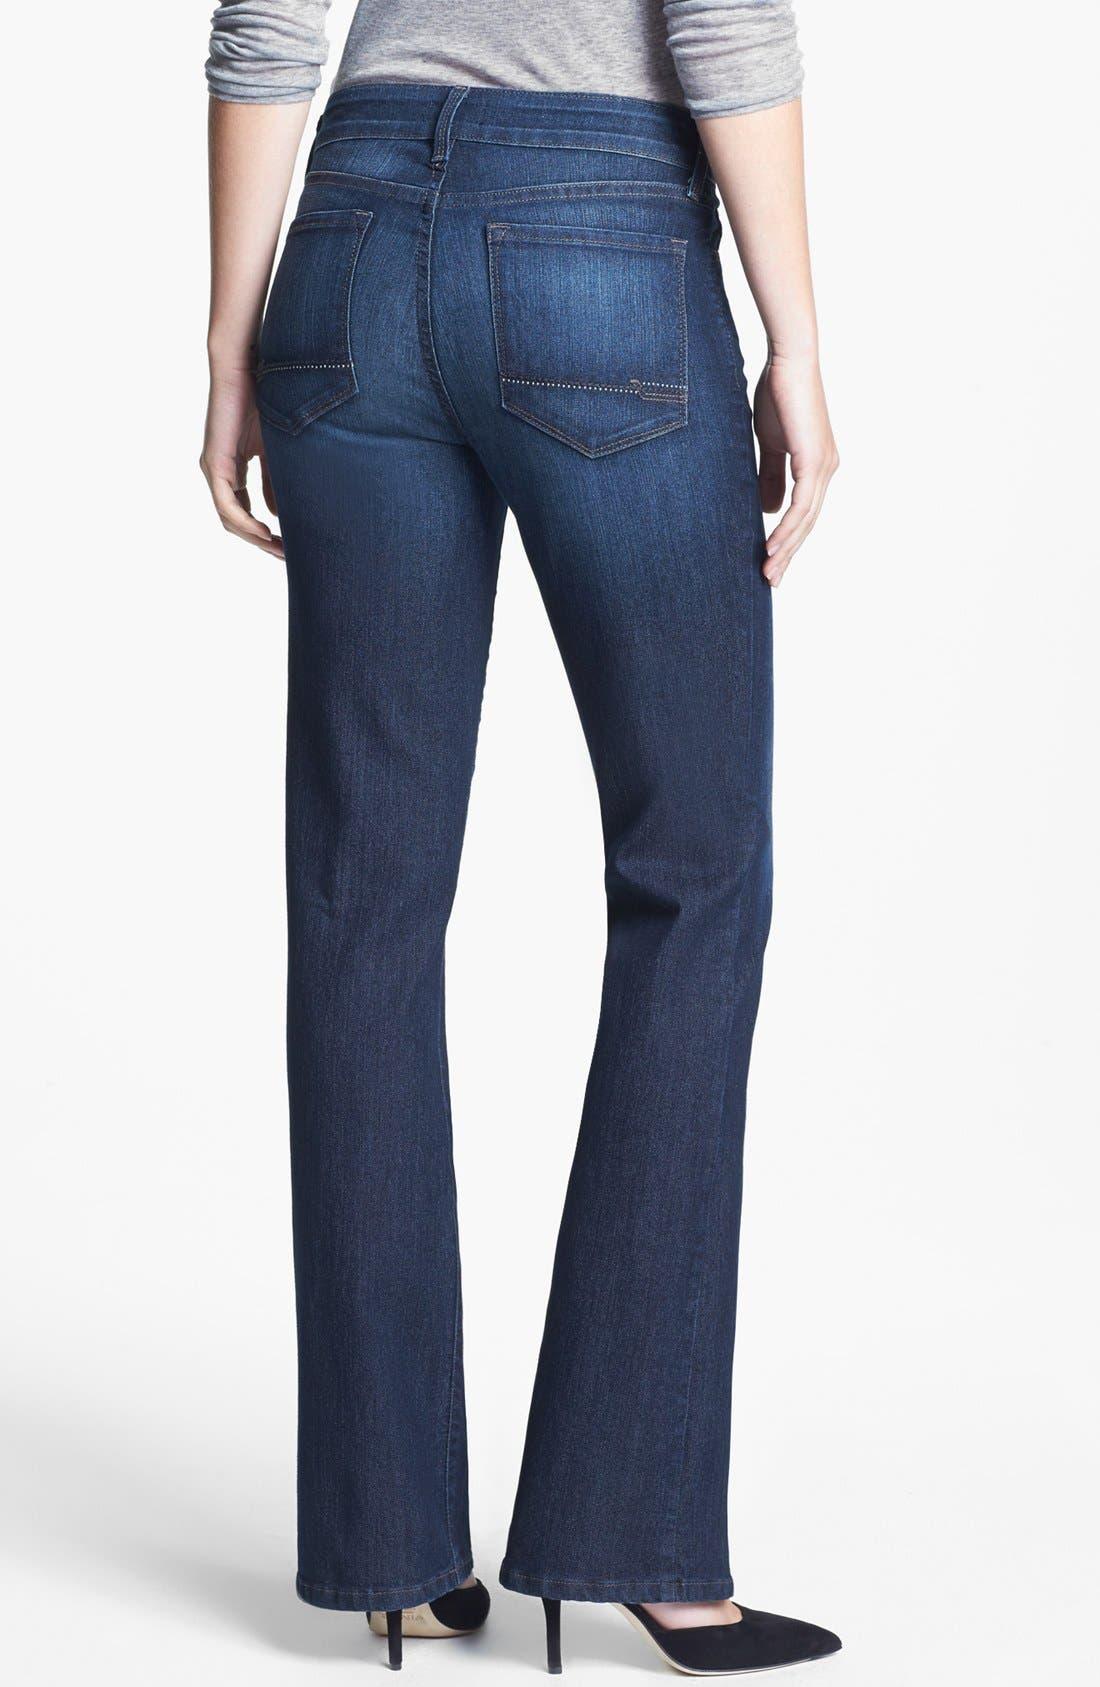 Alternate Image 3  - NYDJ 'Barbara' Stretch Bootcut Jeans (Burbank)